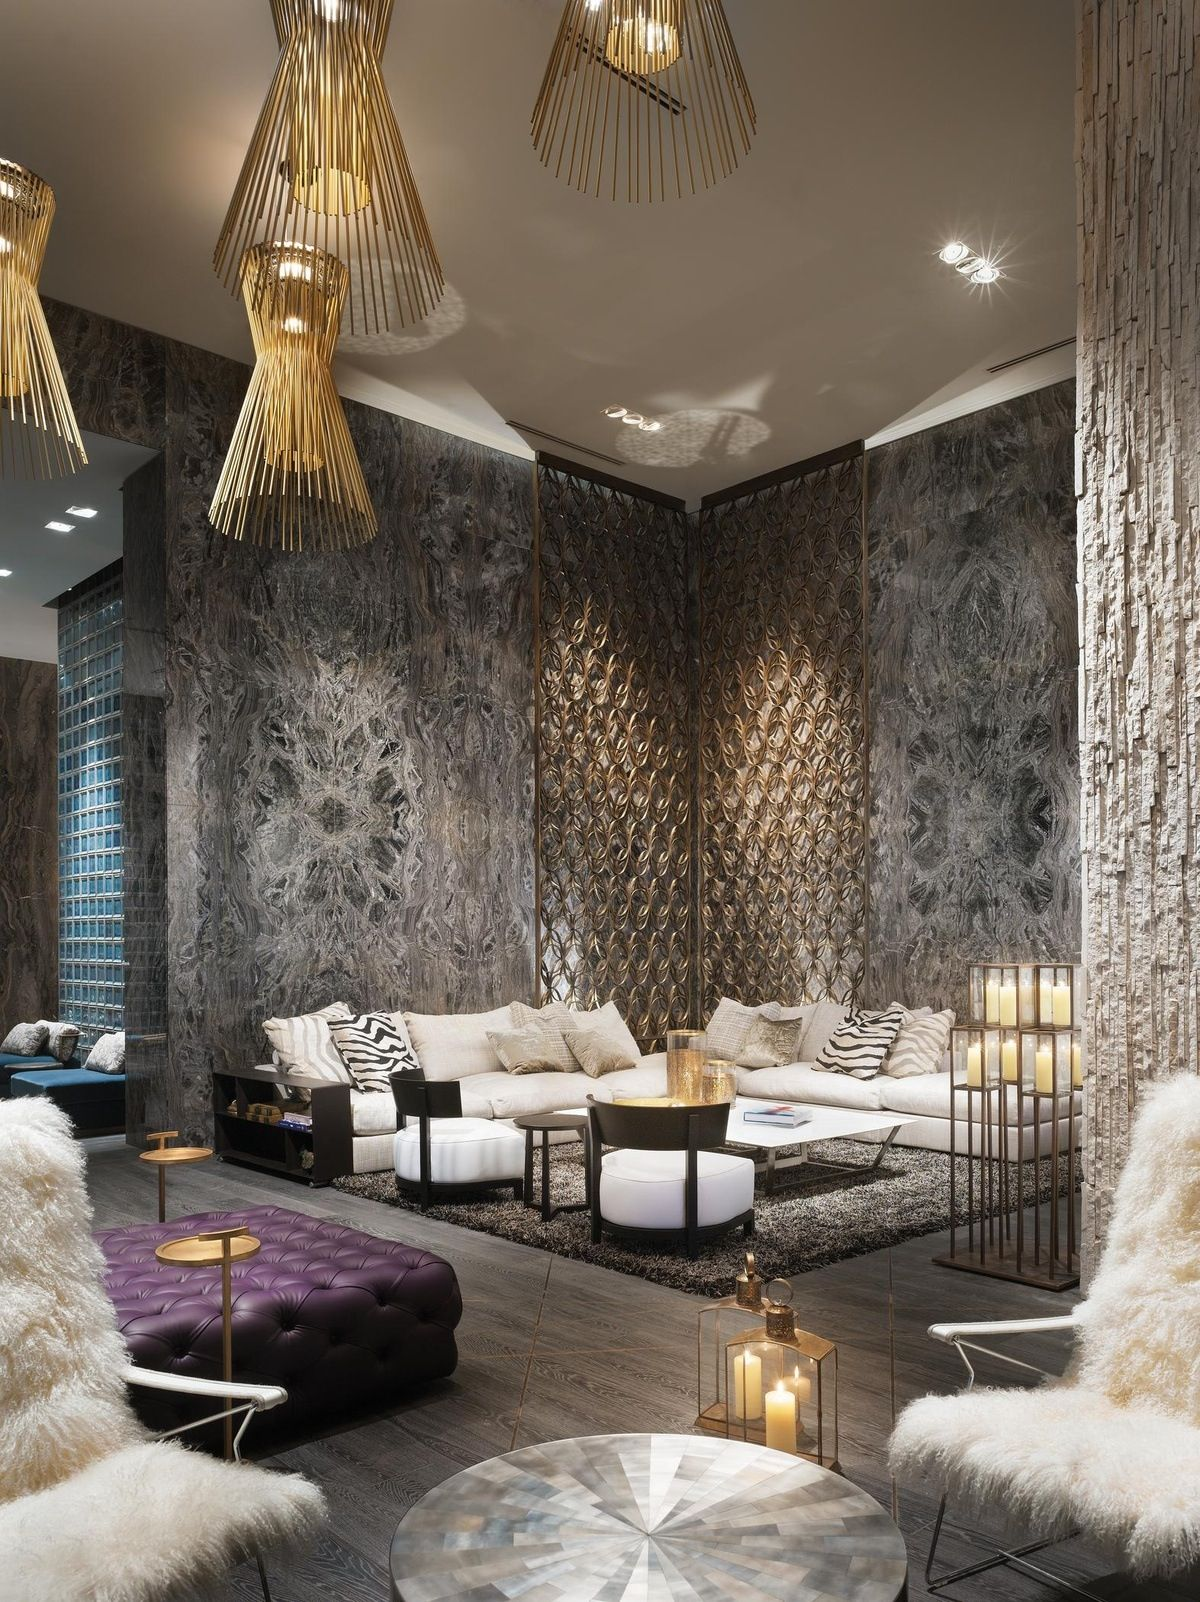 Hotel Rooms Interior Design: Living Room Bar, Luxury Interior, Hotel